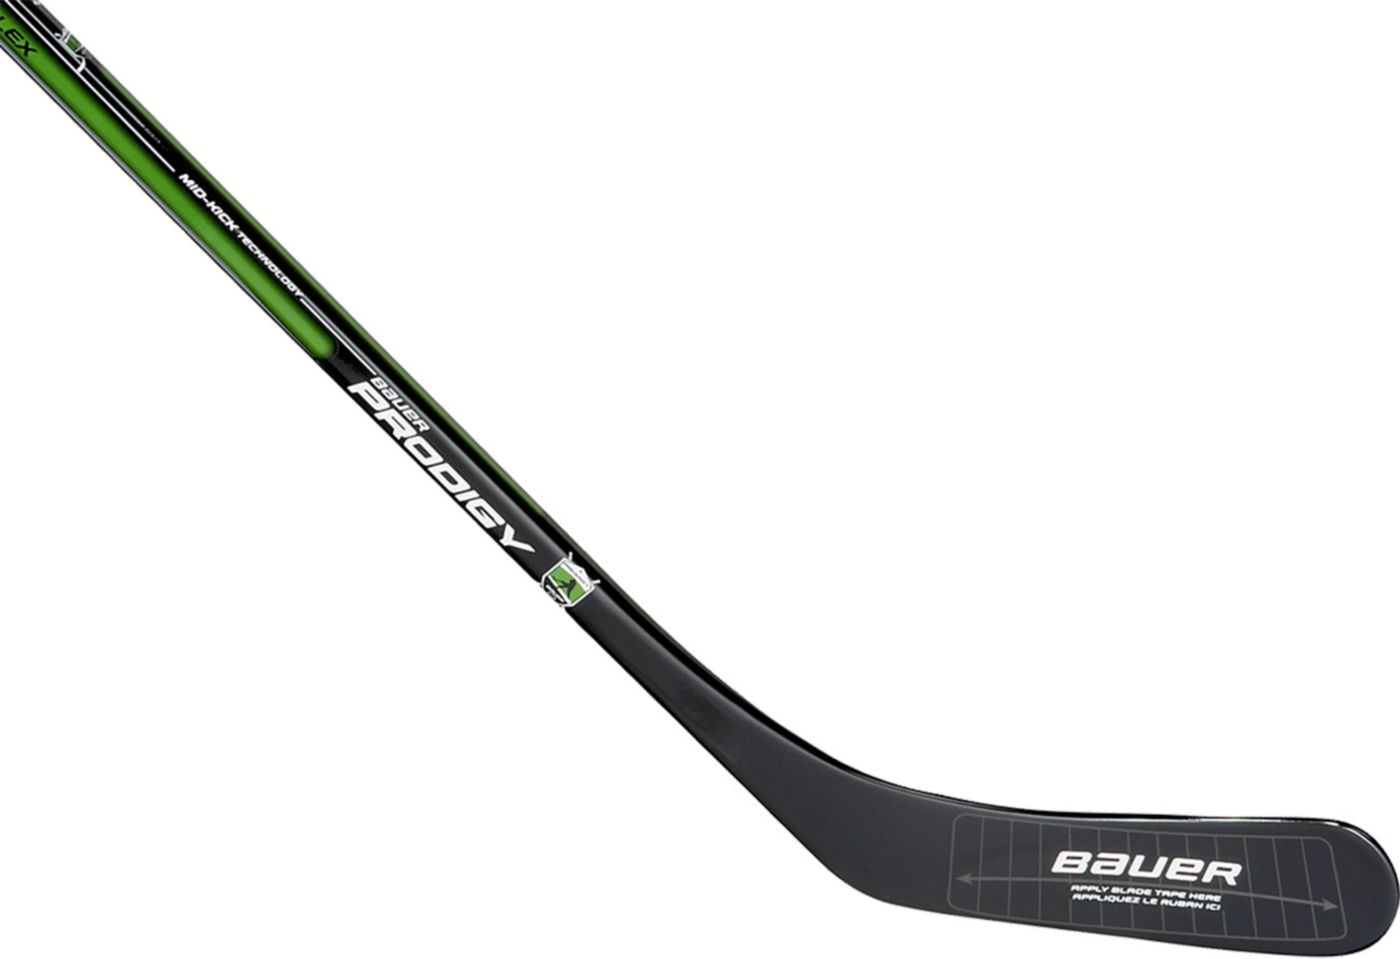 Bauer Youth Prodigy Composite 42'' Ice Hockey Stick